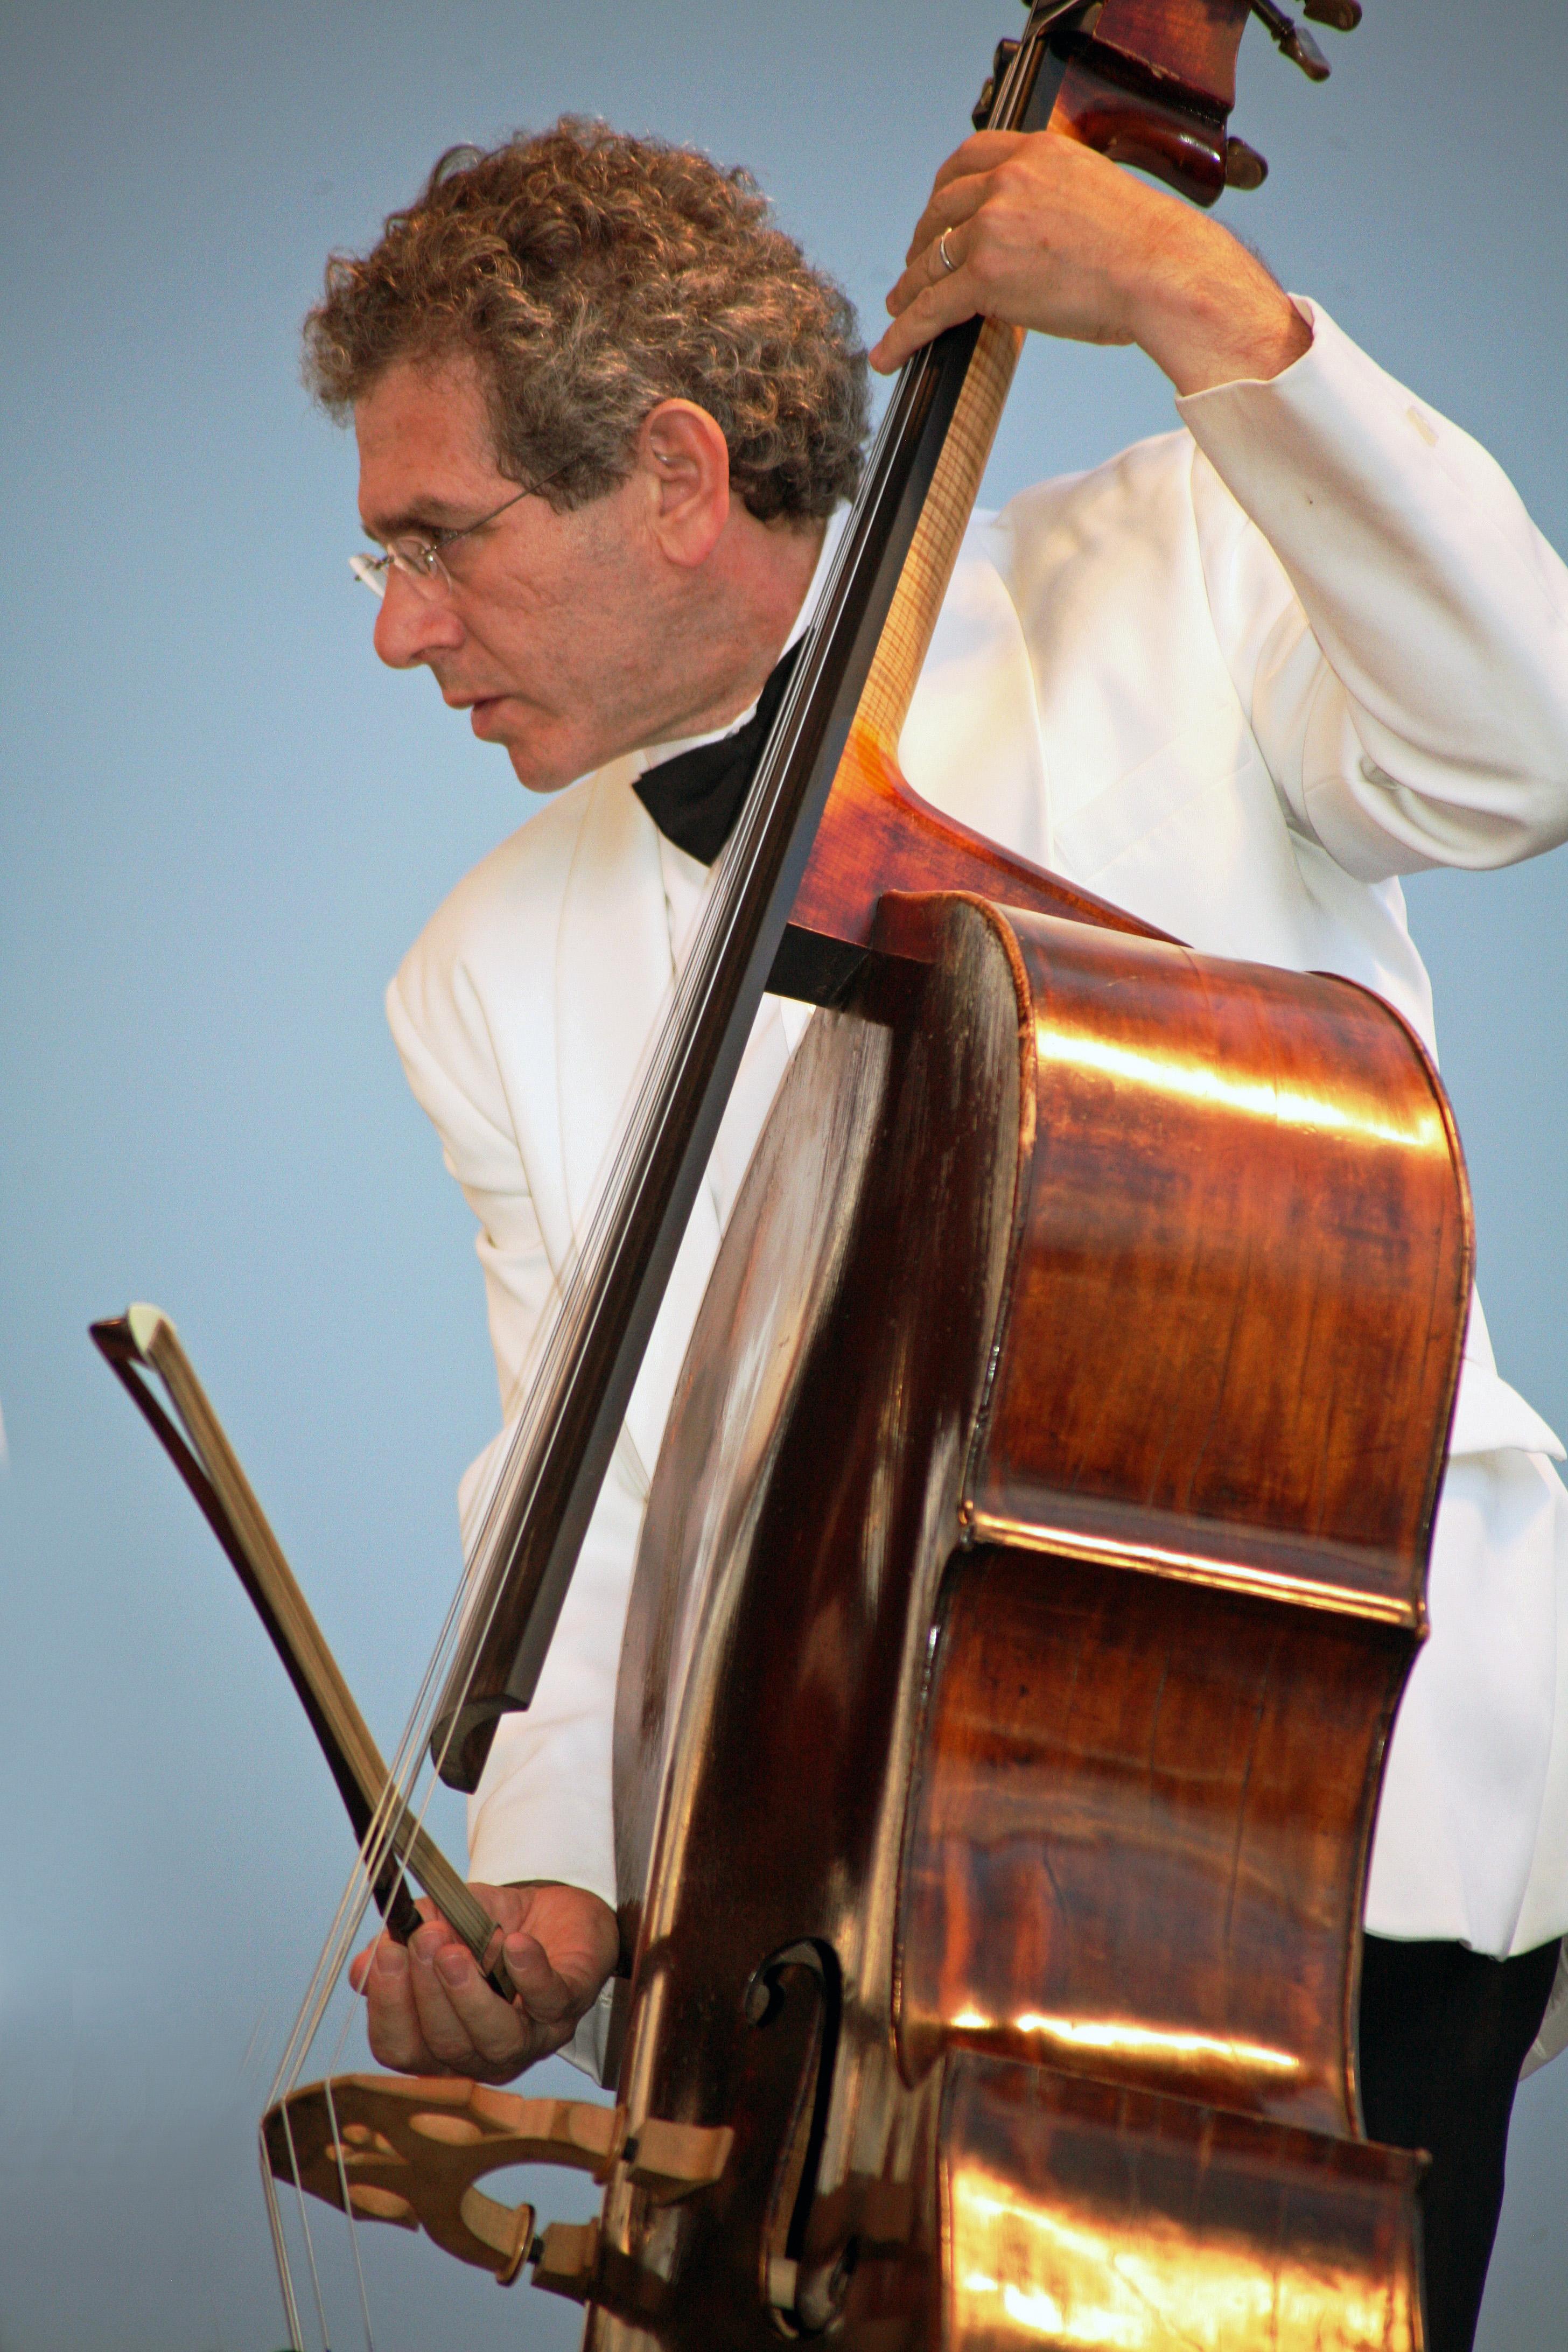 Kostenlose foto Mann Person Musik Konzert Musiker Musikinstrument Geige Kunst Bass Orchester Performance Bassist Cello Gitarrist